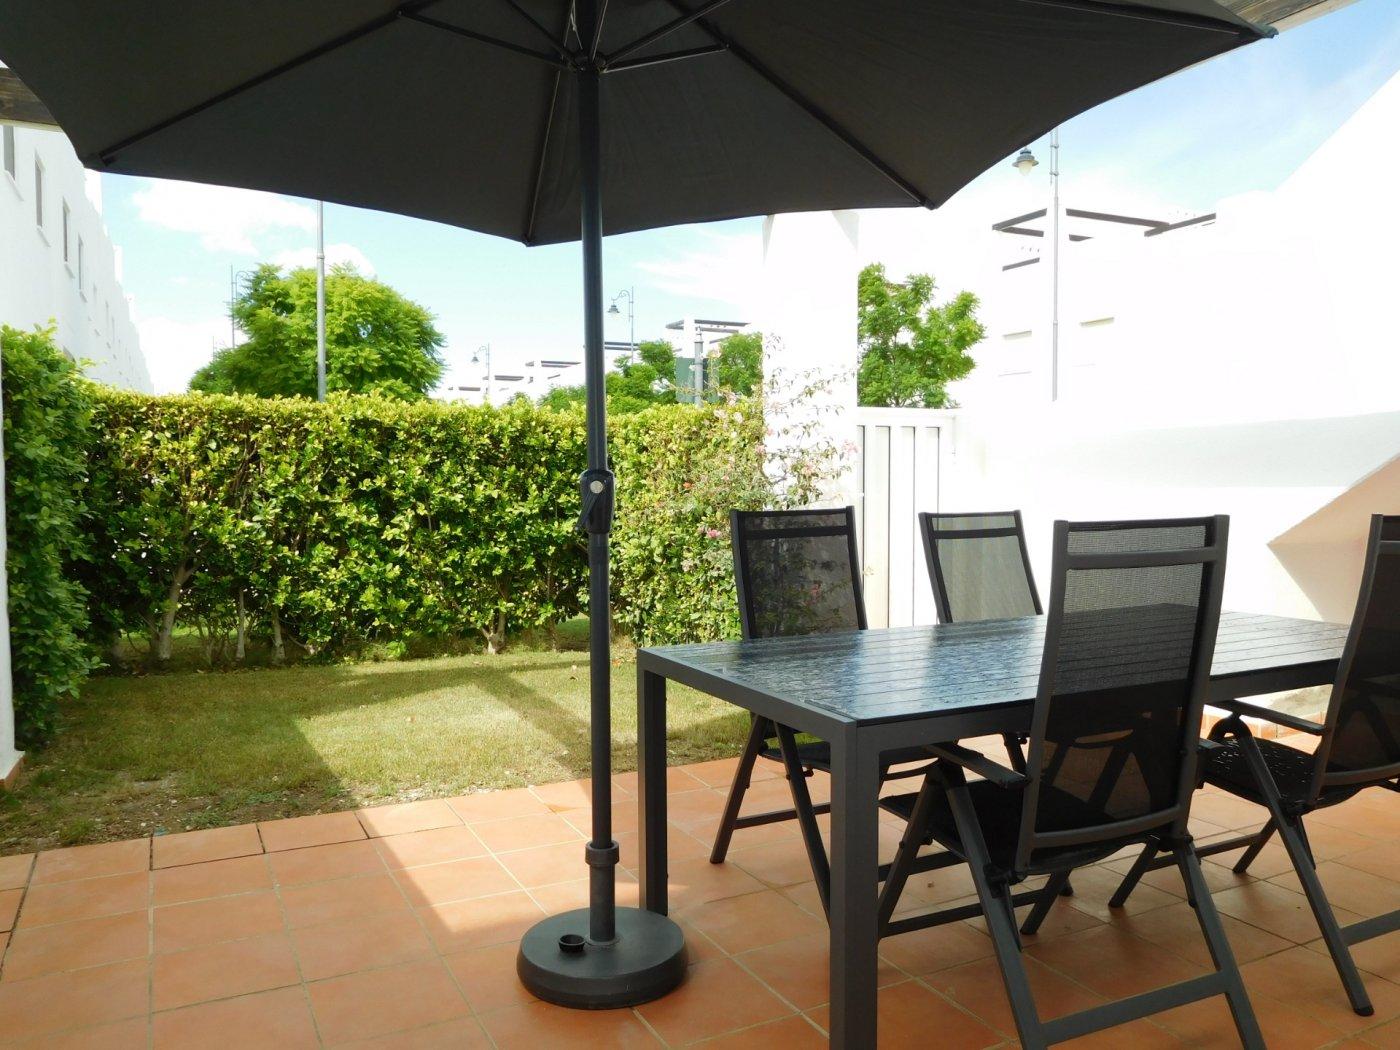 Gallery Image 23 of Apartment For rent in Condado De Alhama, Alhama De Murcia With Pool